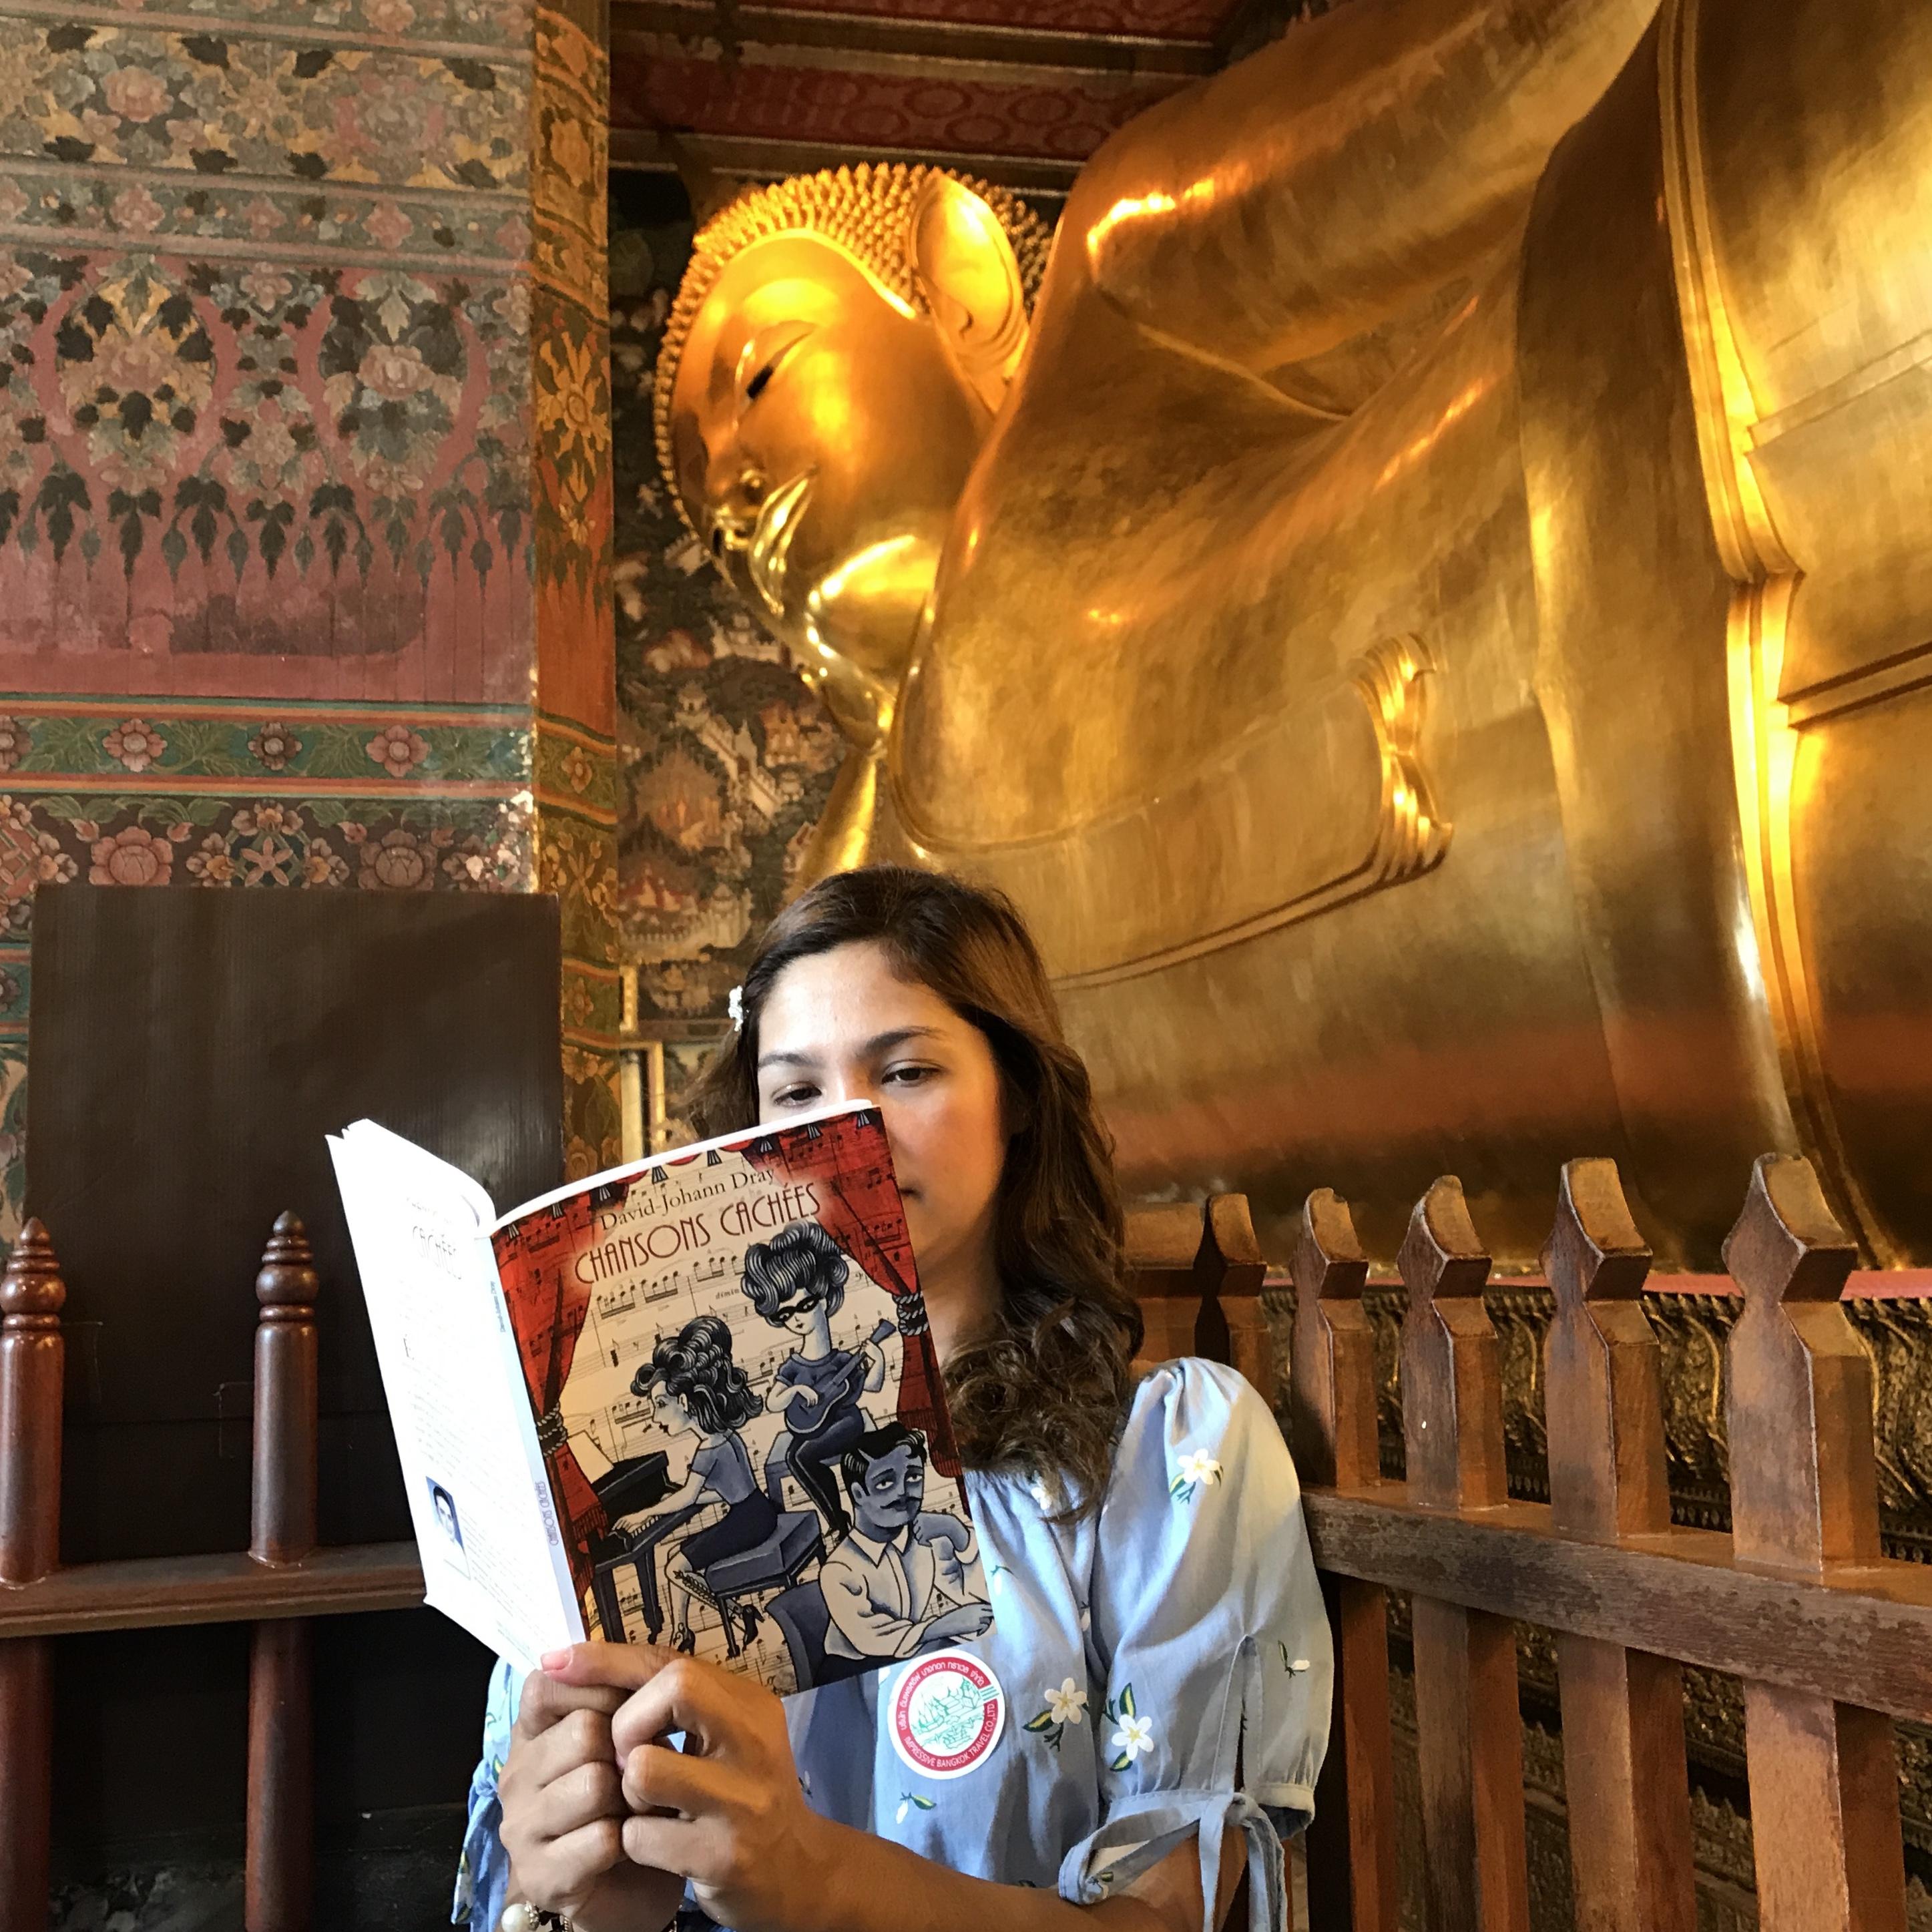 La Fille au Bouddha couché - Bangkok